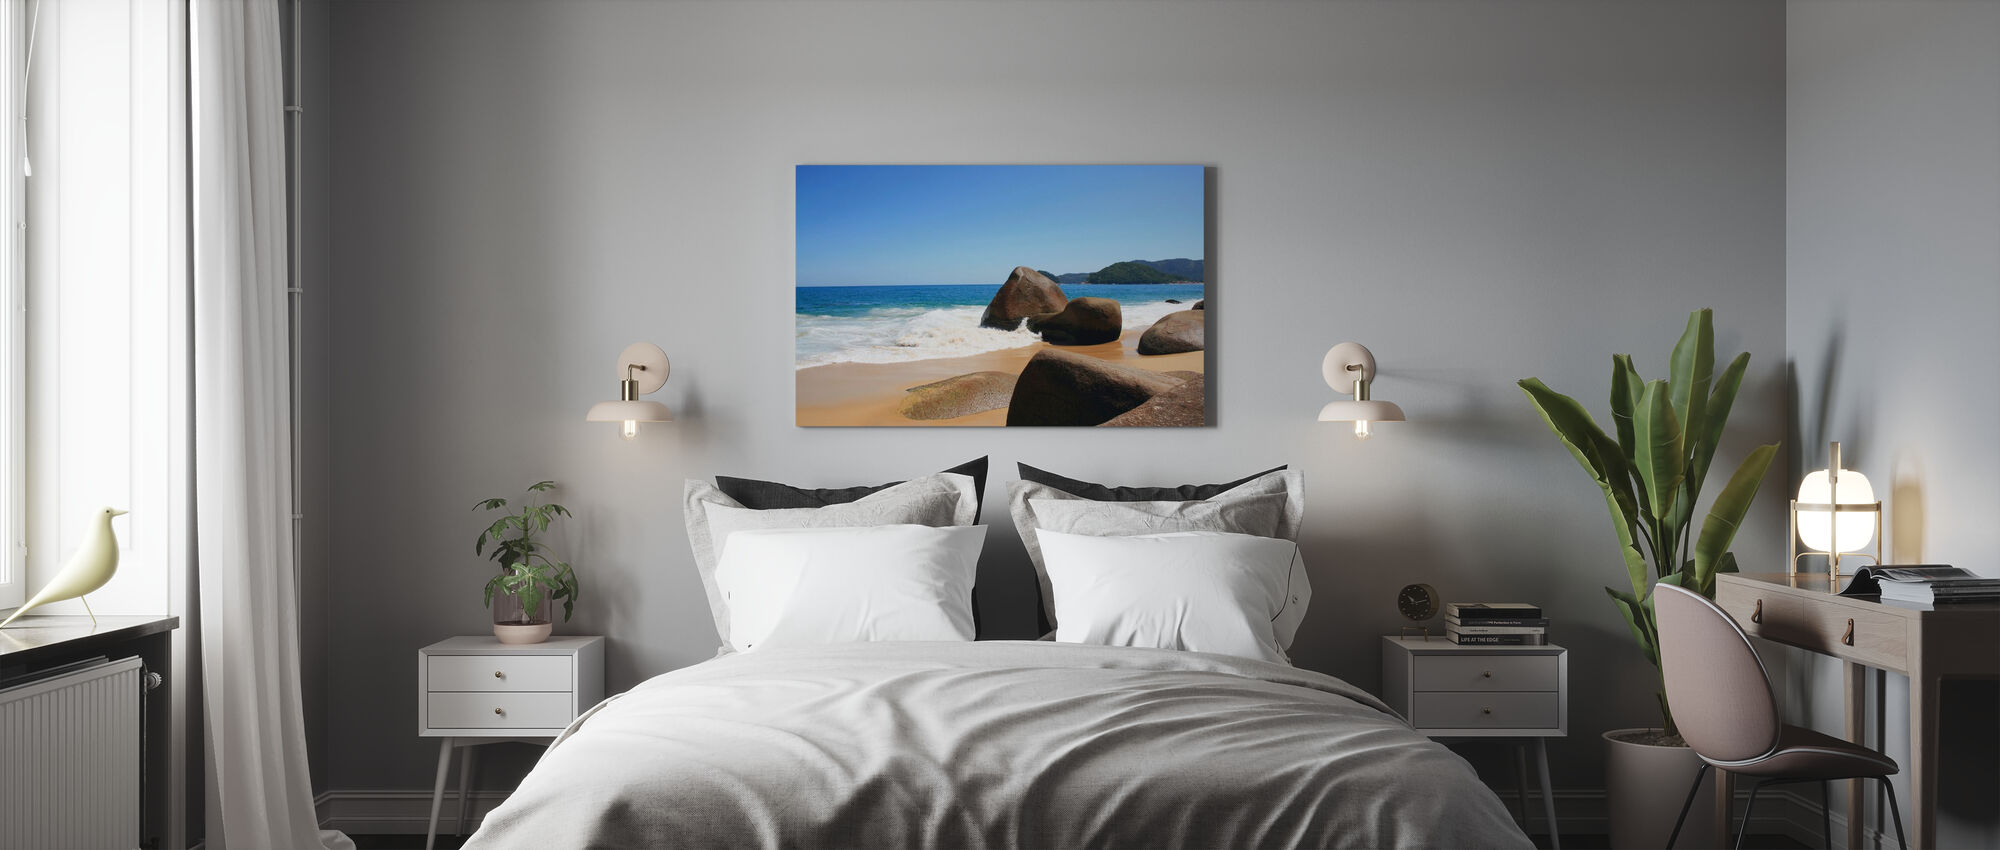 Mooi Strand in Brazilië - Canvas print - Slaapkamer